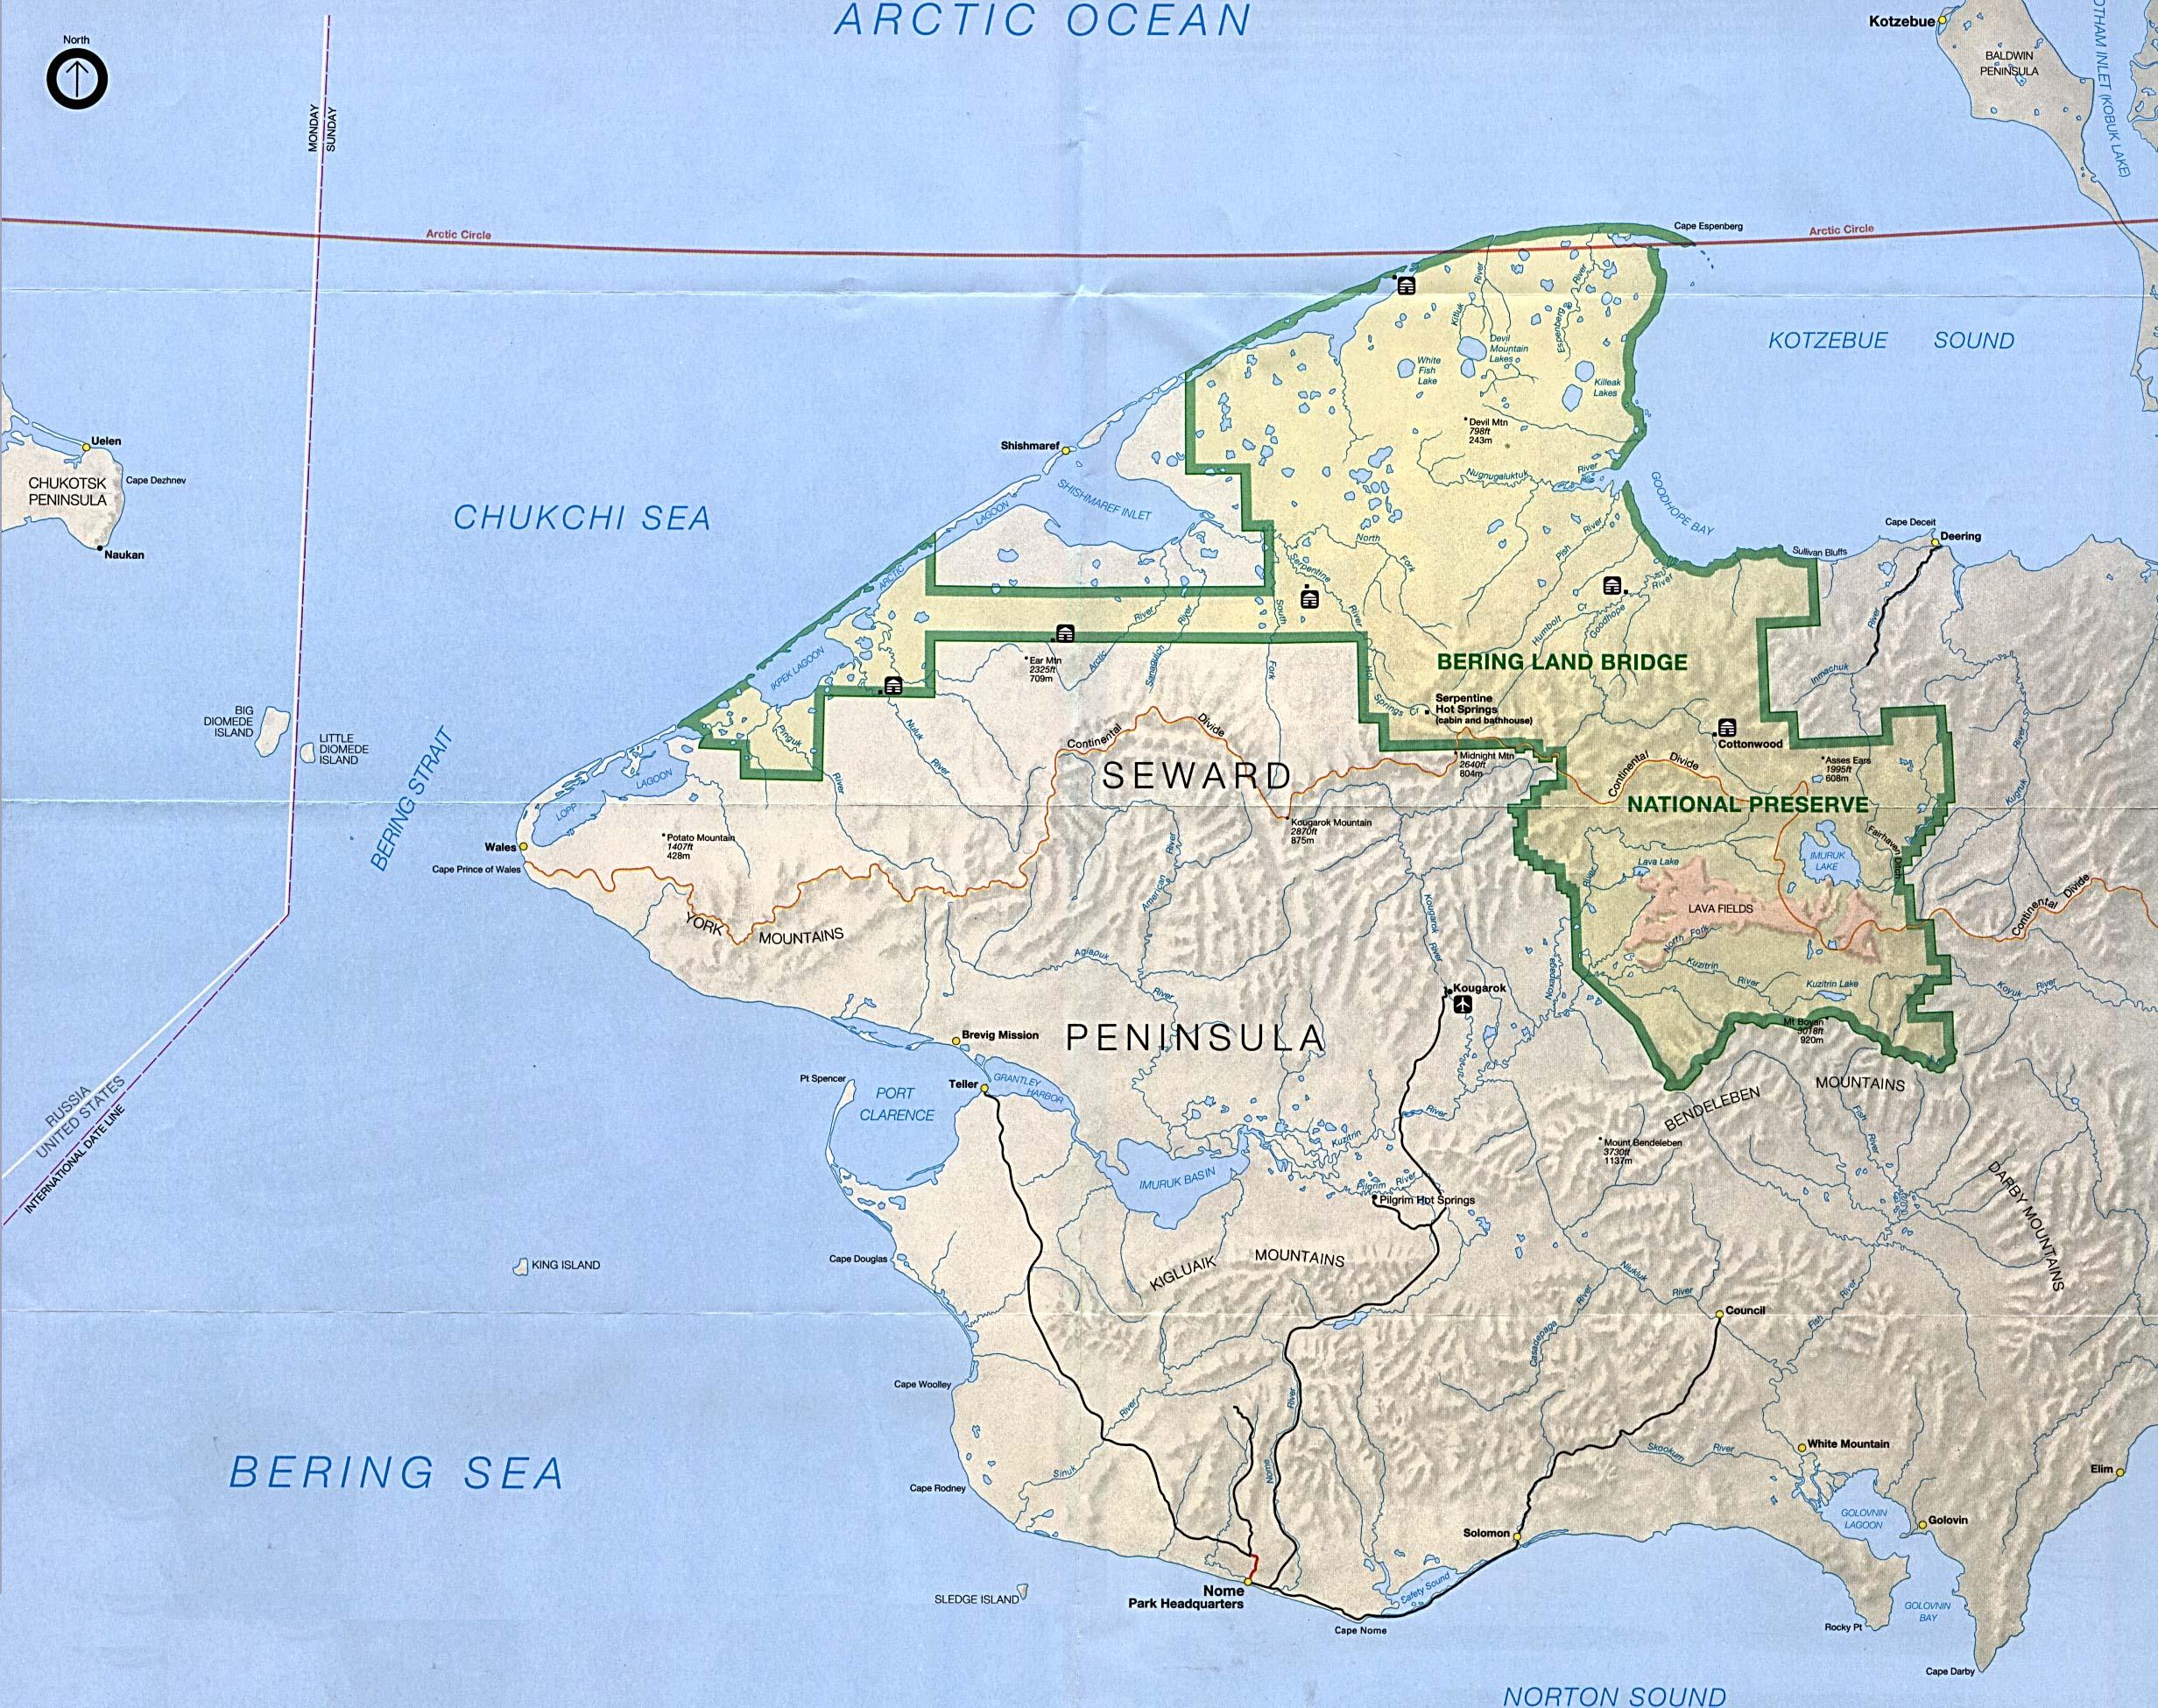 map to enlarge bering land bridge national preserve click